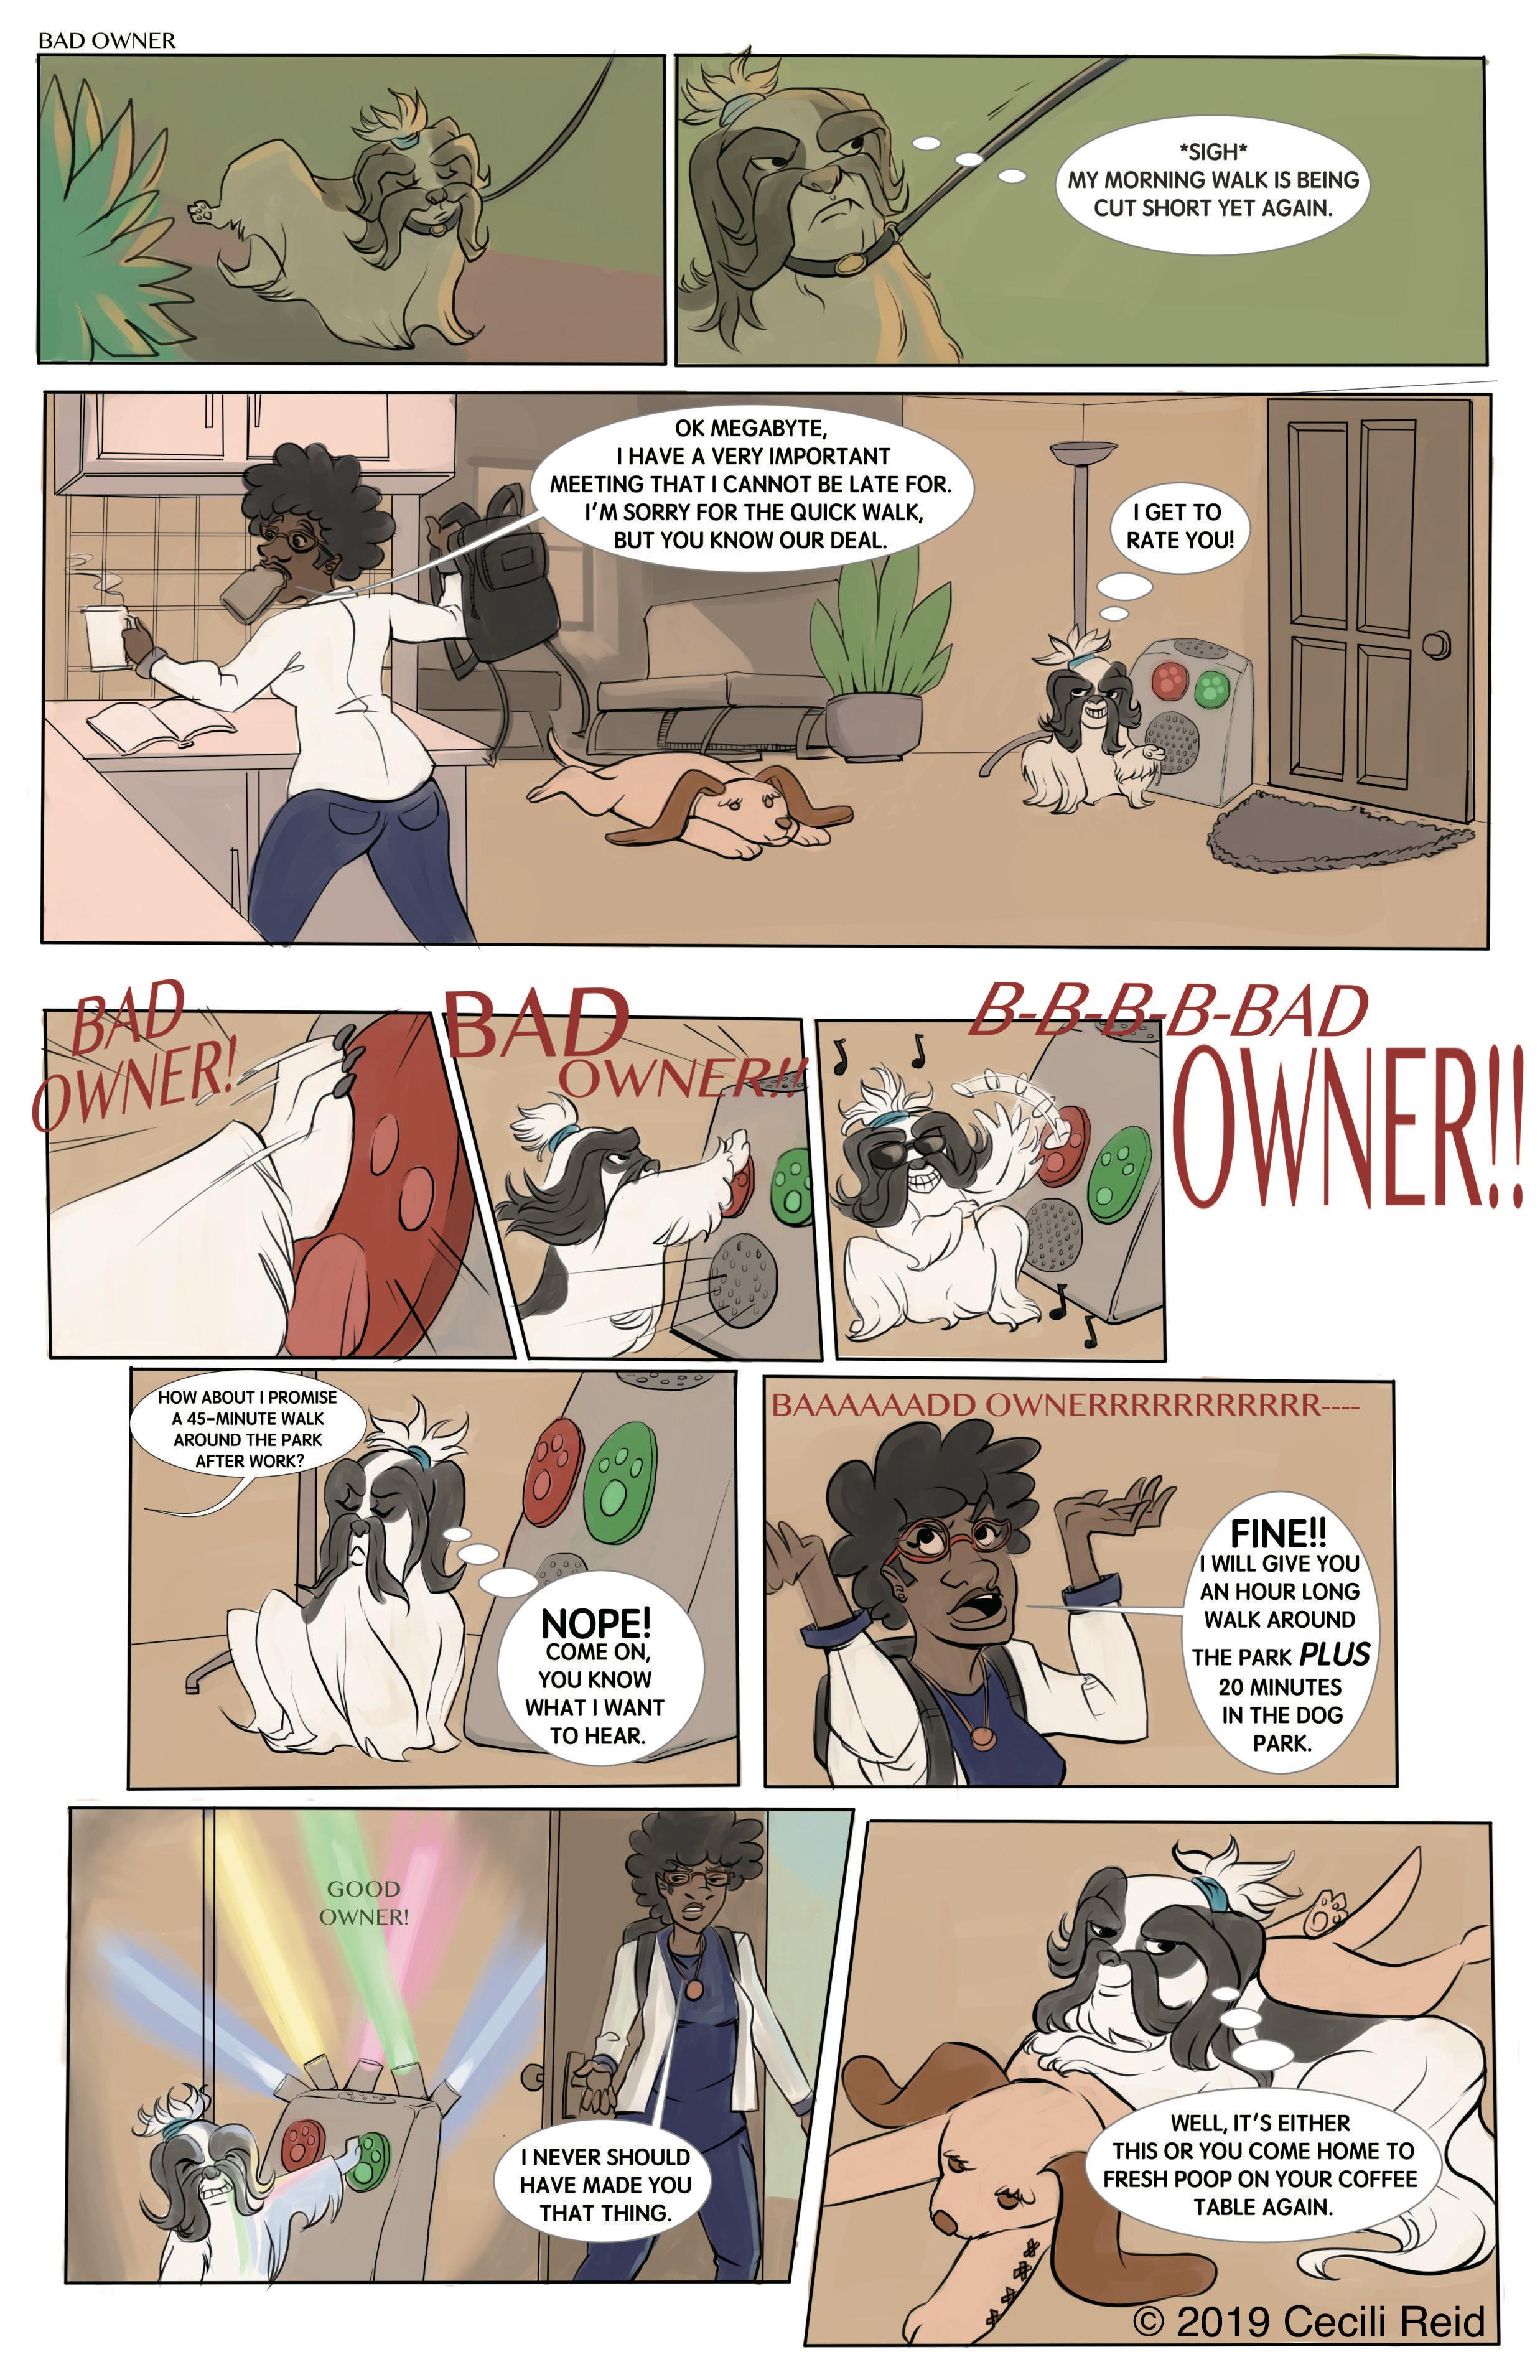 Megabyte The Doggie Butler: Bad Owner!